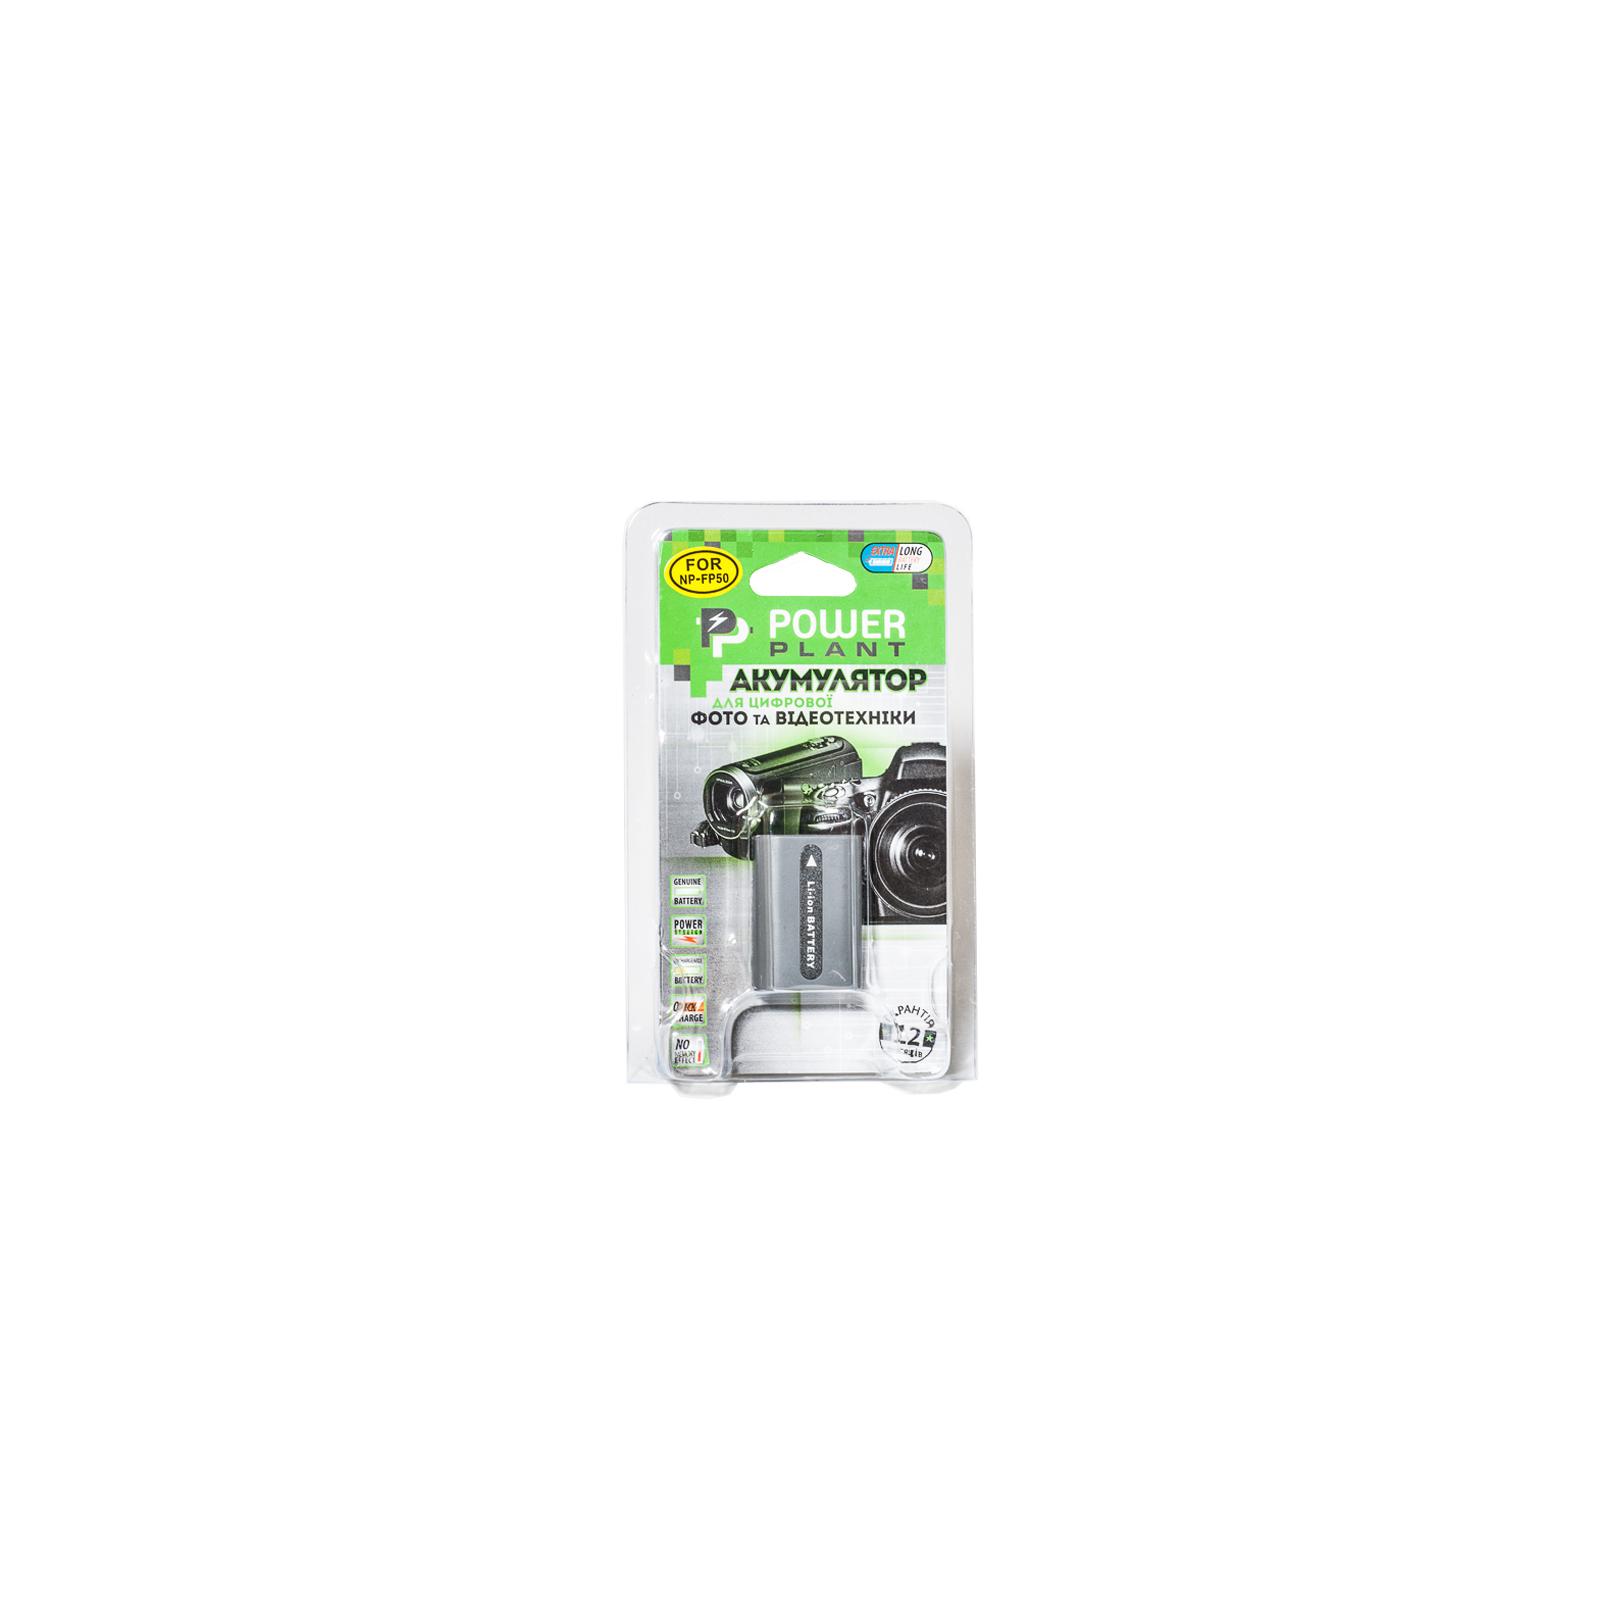 Аккумулятор к фото/видео PowerPlant Sony NP-FP50 (DV00DV1025) изображение 3